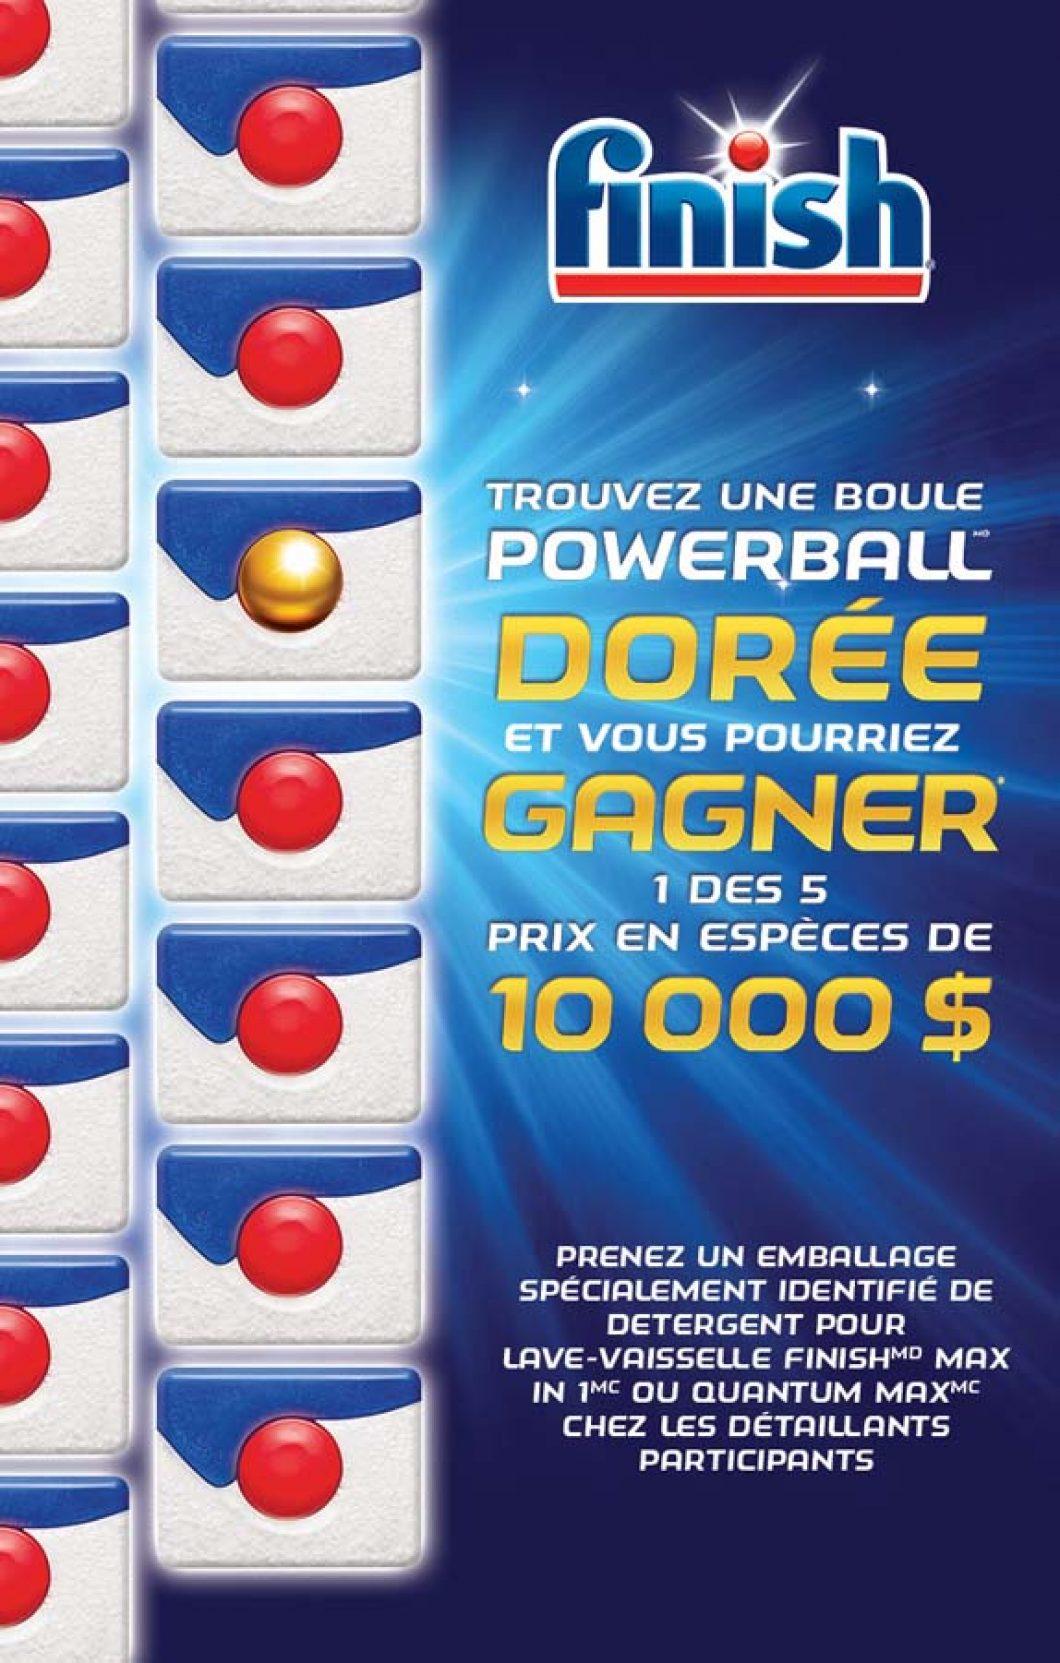 concours-finish-powerball-doree